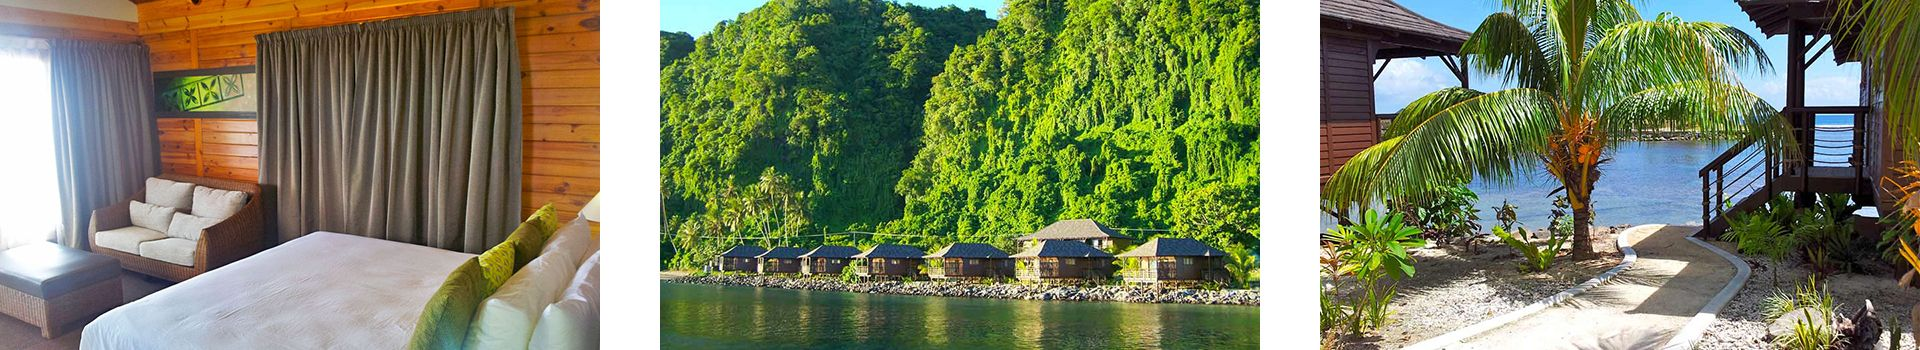 Waterfront Villas - Aga Reef Resort - Samoa